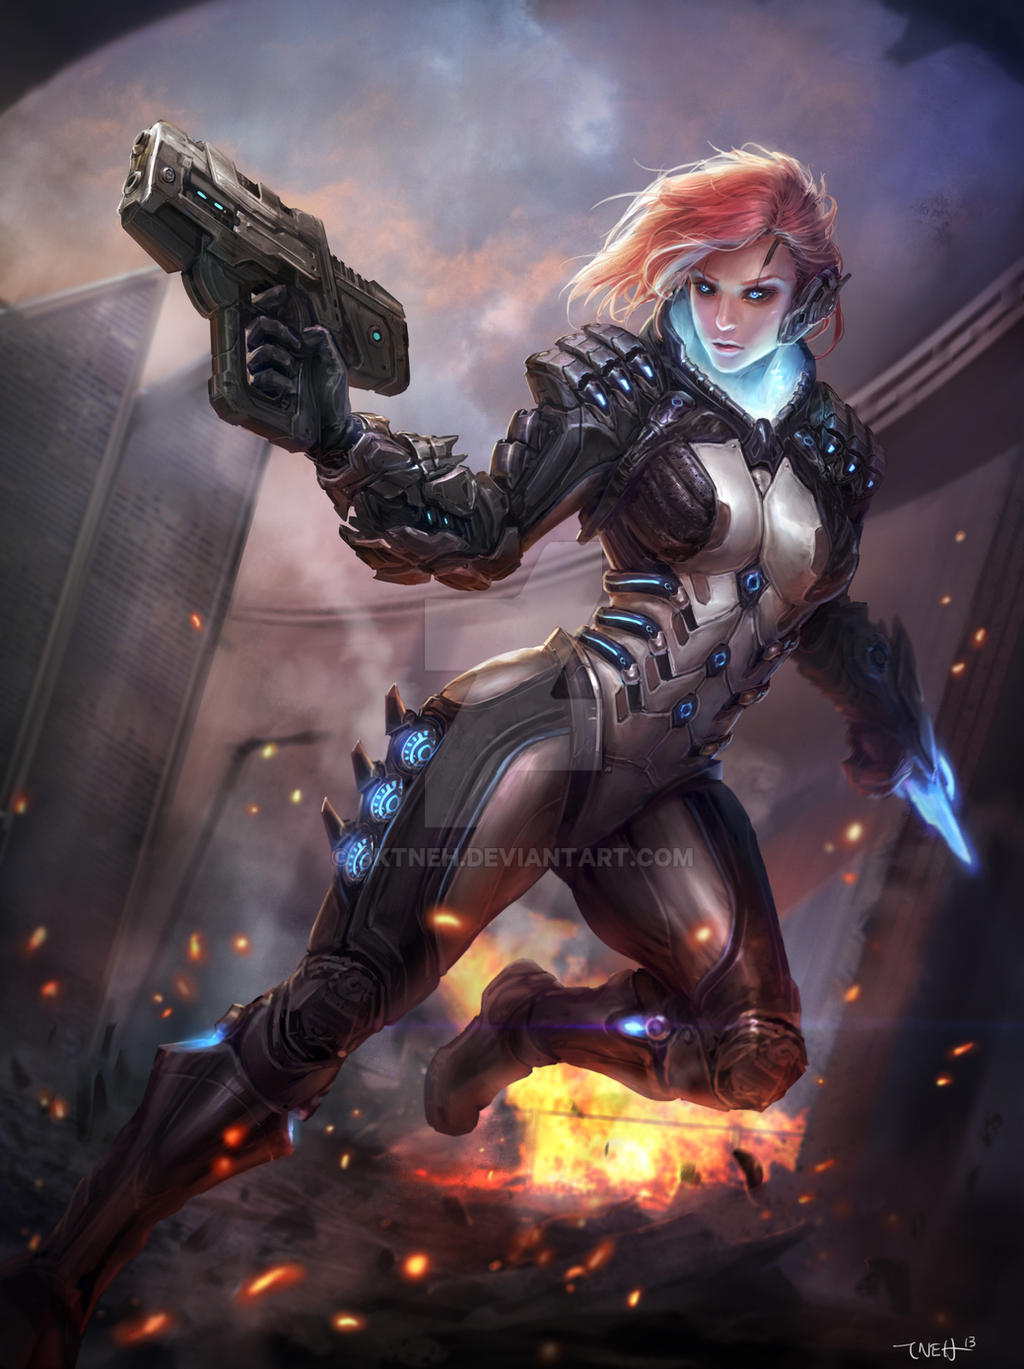 War Cyborg by SKtneh